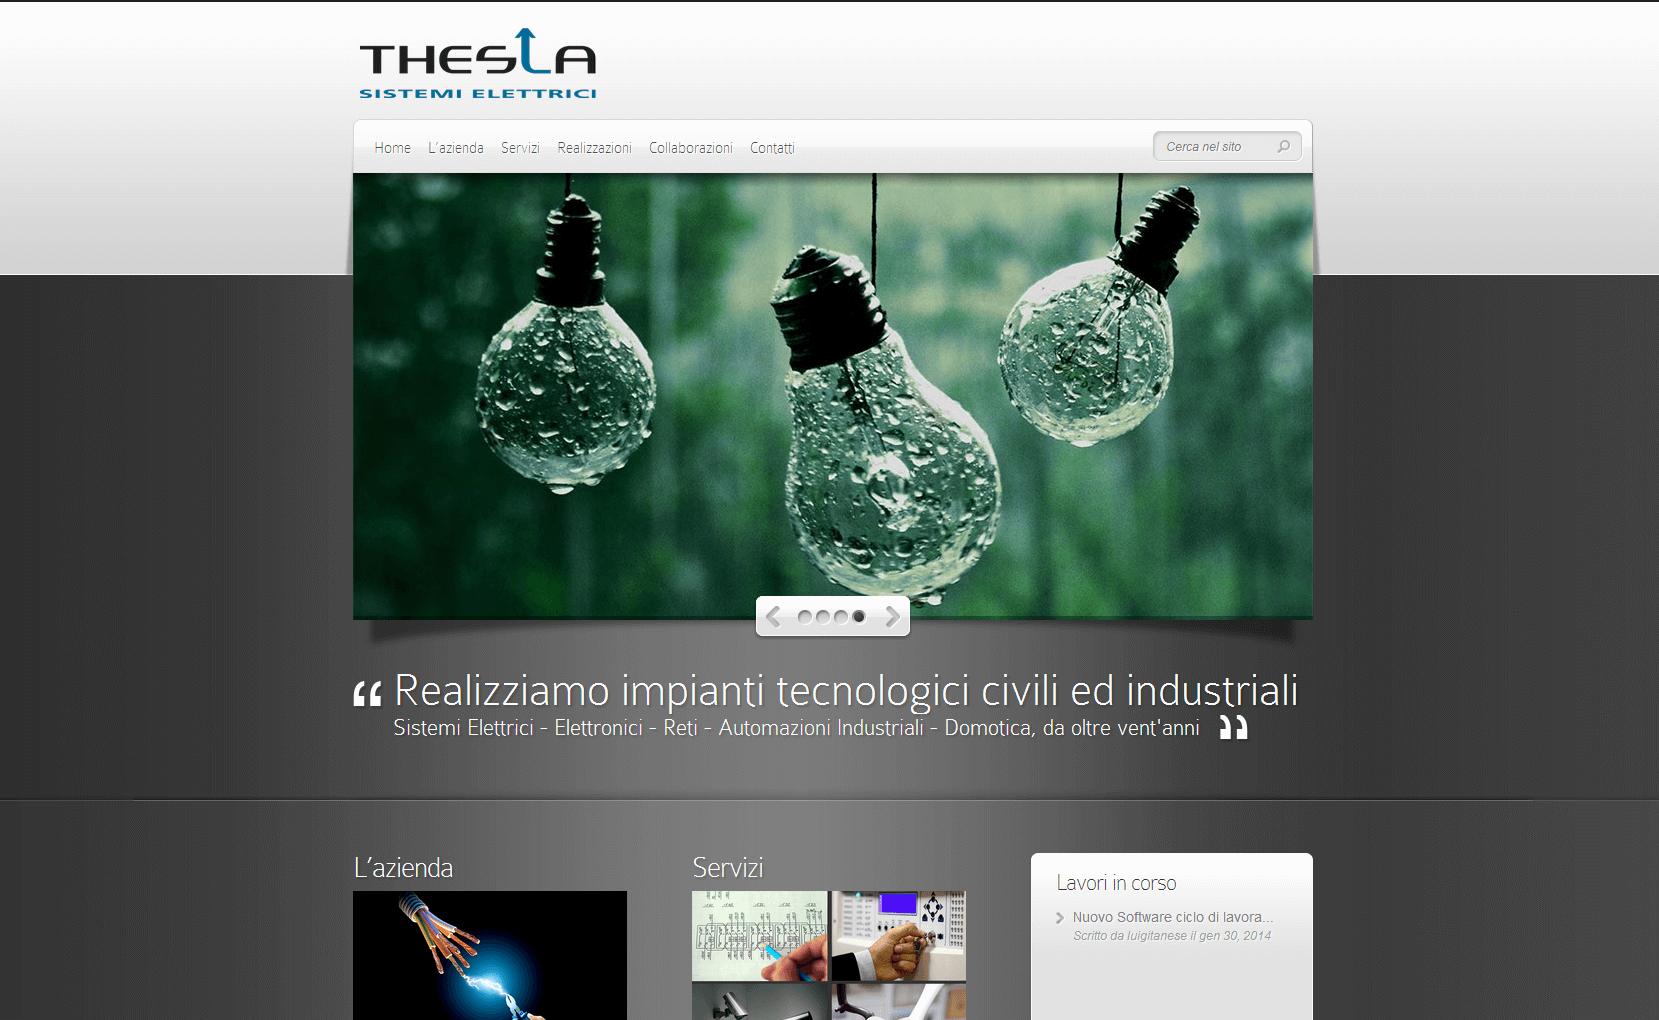 Thesla - Impianti Elettrici